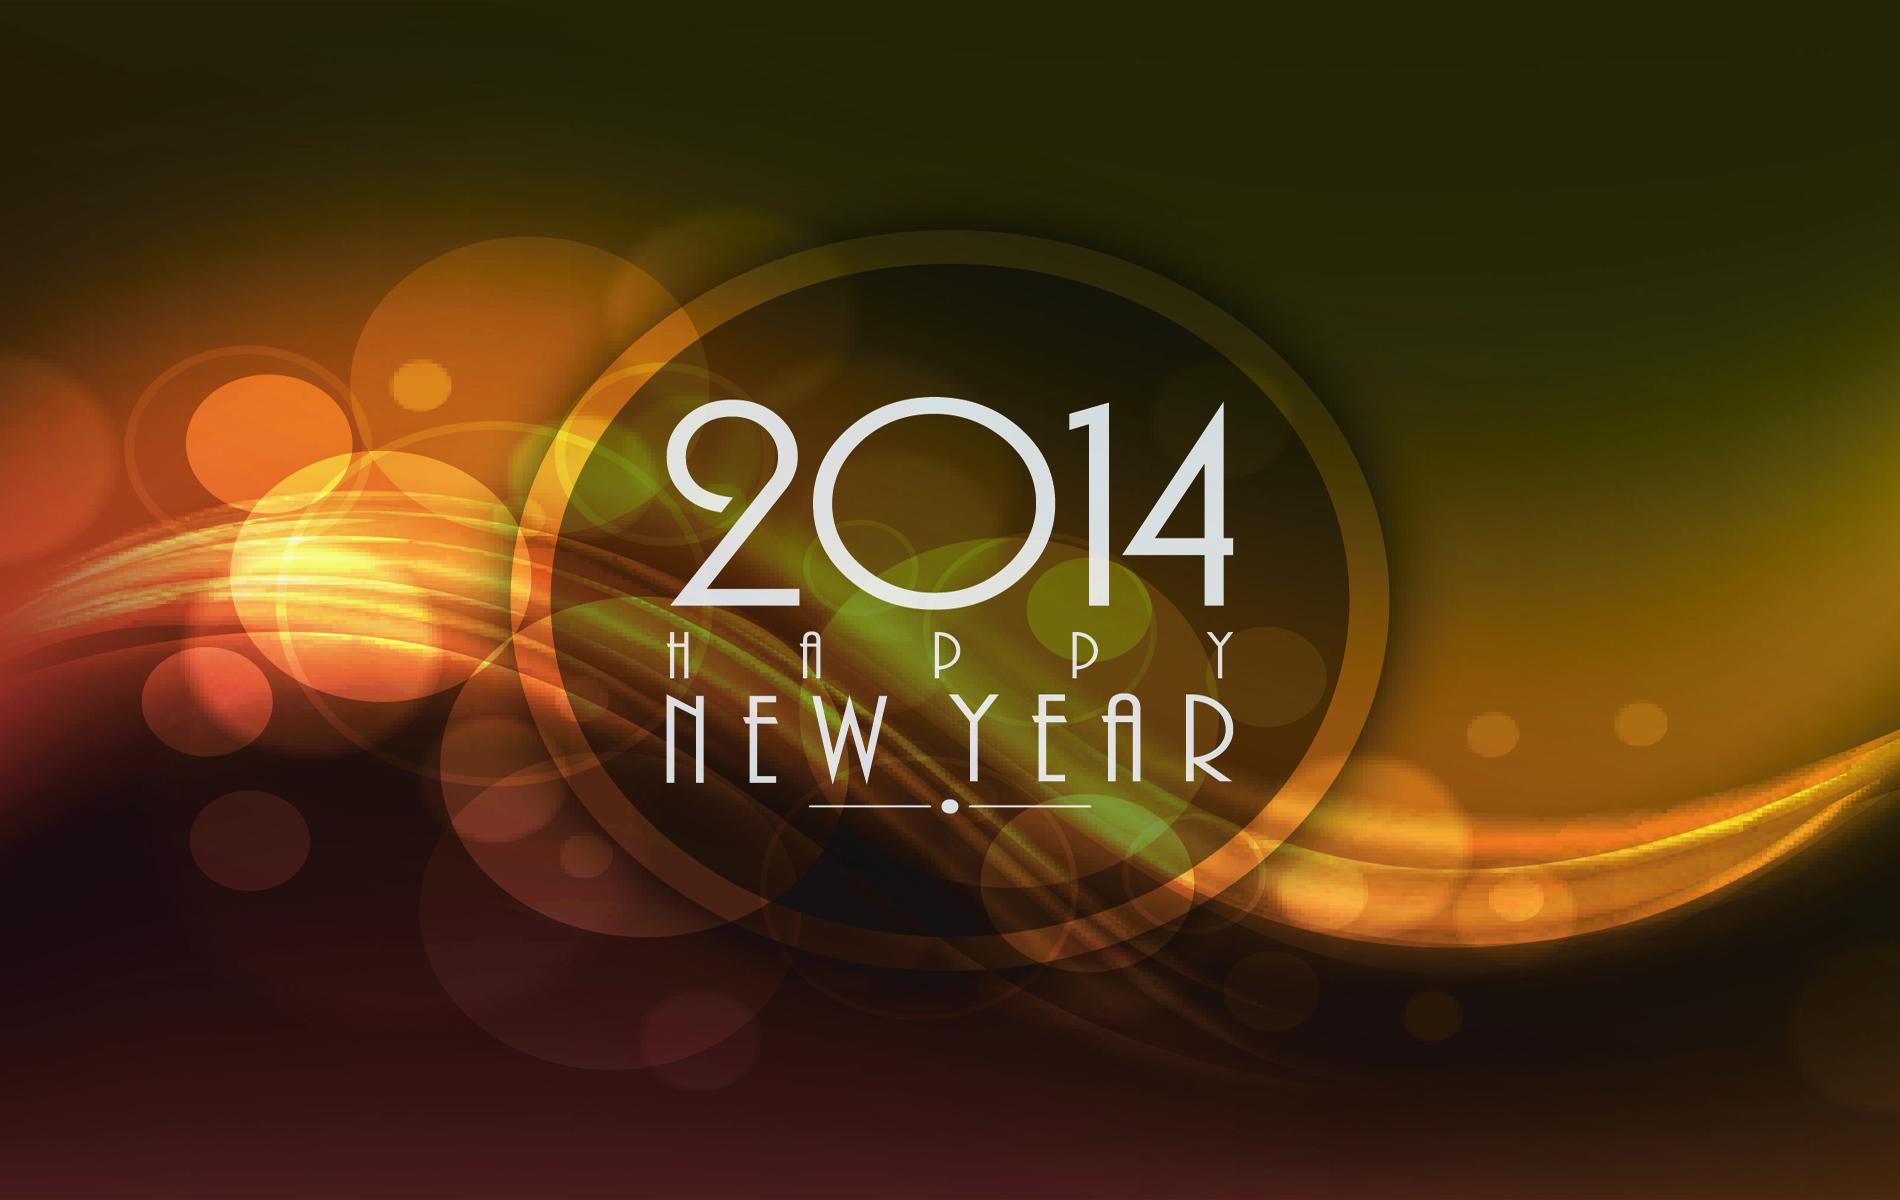 HAPPY_NEW_YEAR_2014_HD_WALLPAPER_1923044143